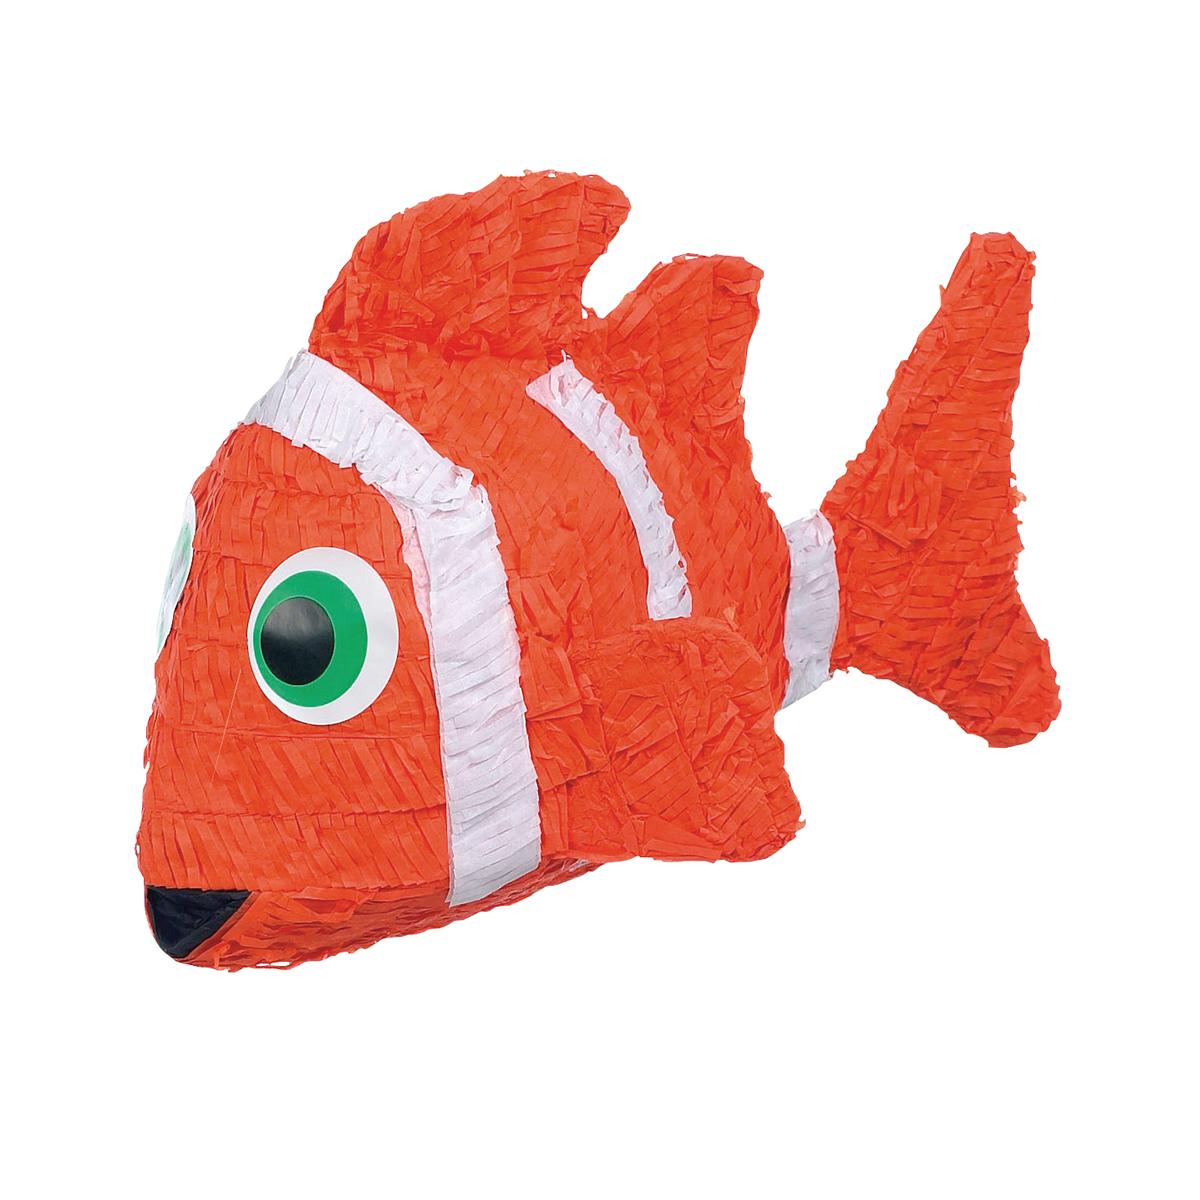 Piñata - poisson clown